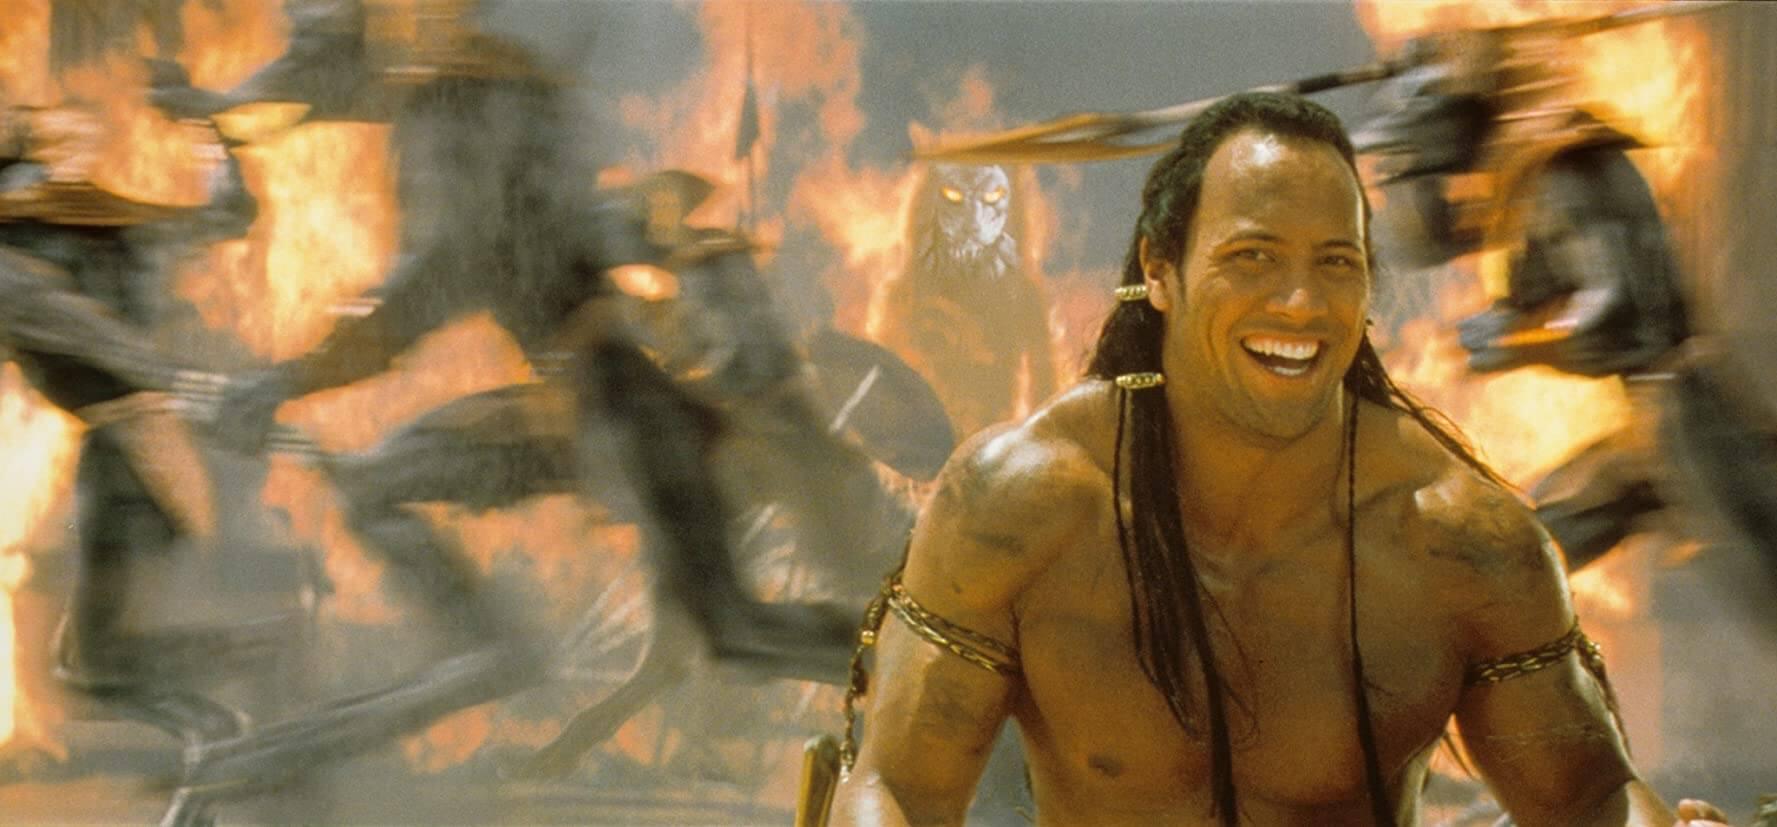 Dwayne Johnson in The Mummy Returns (2001)